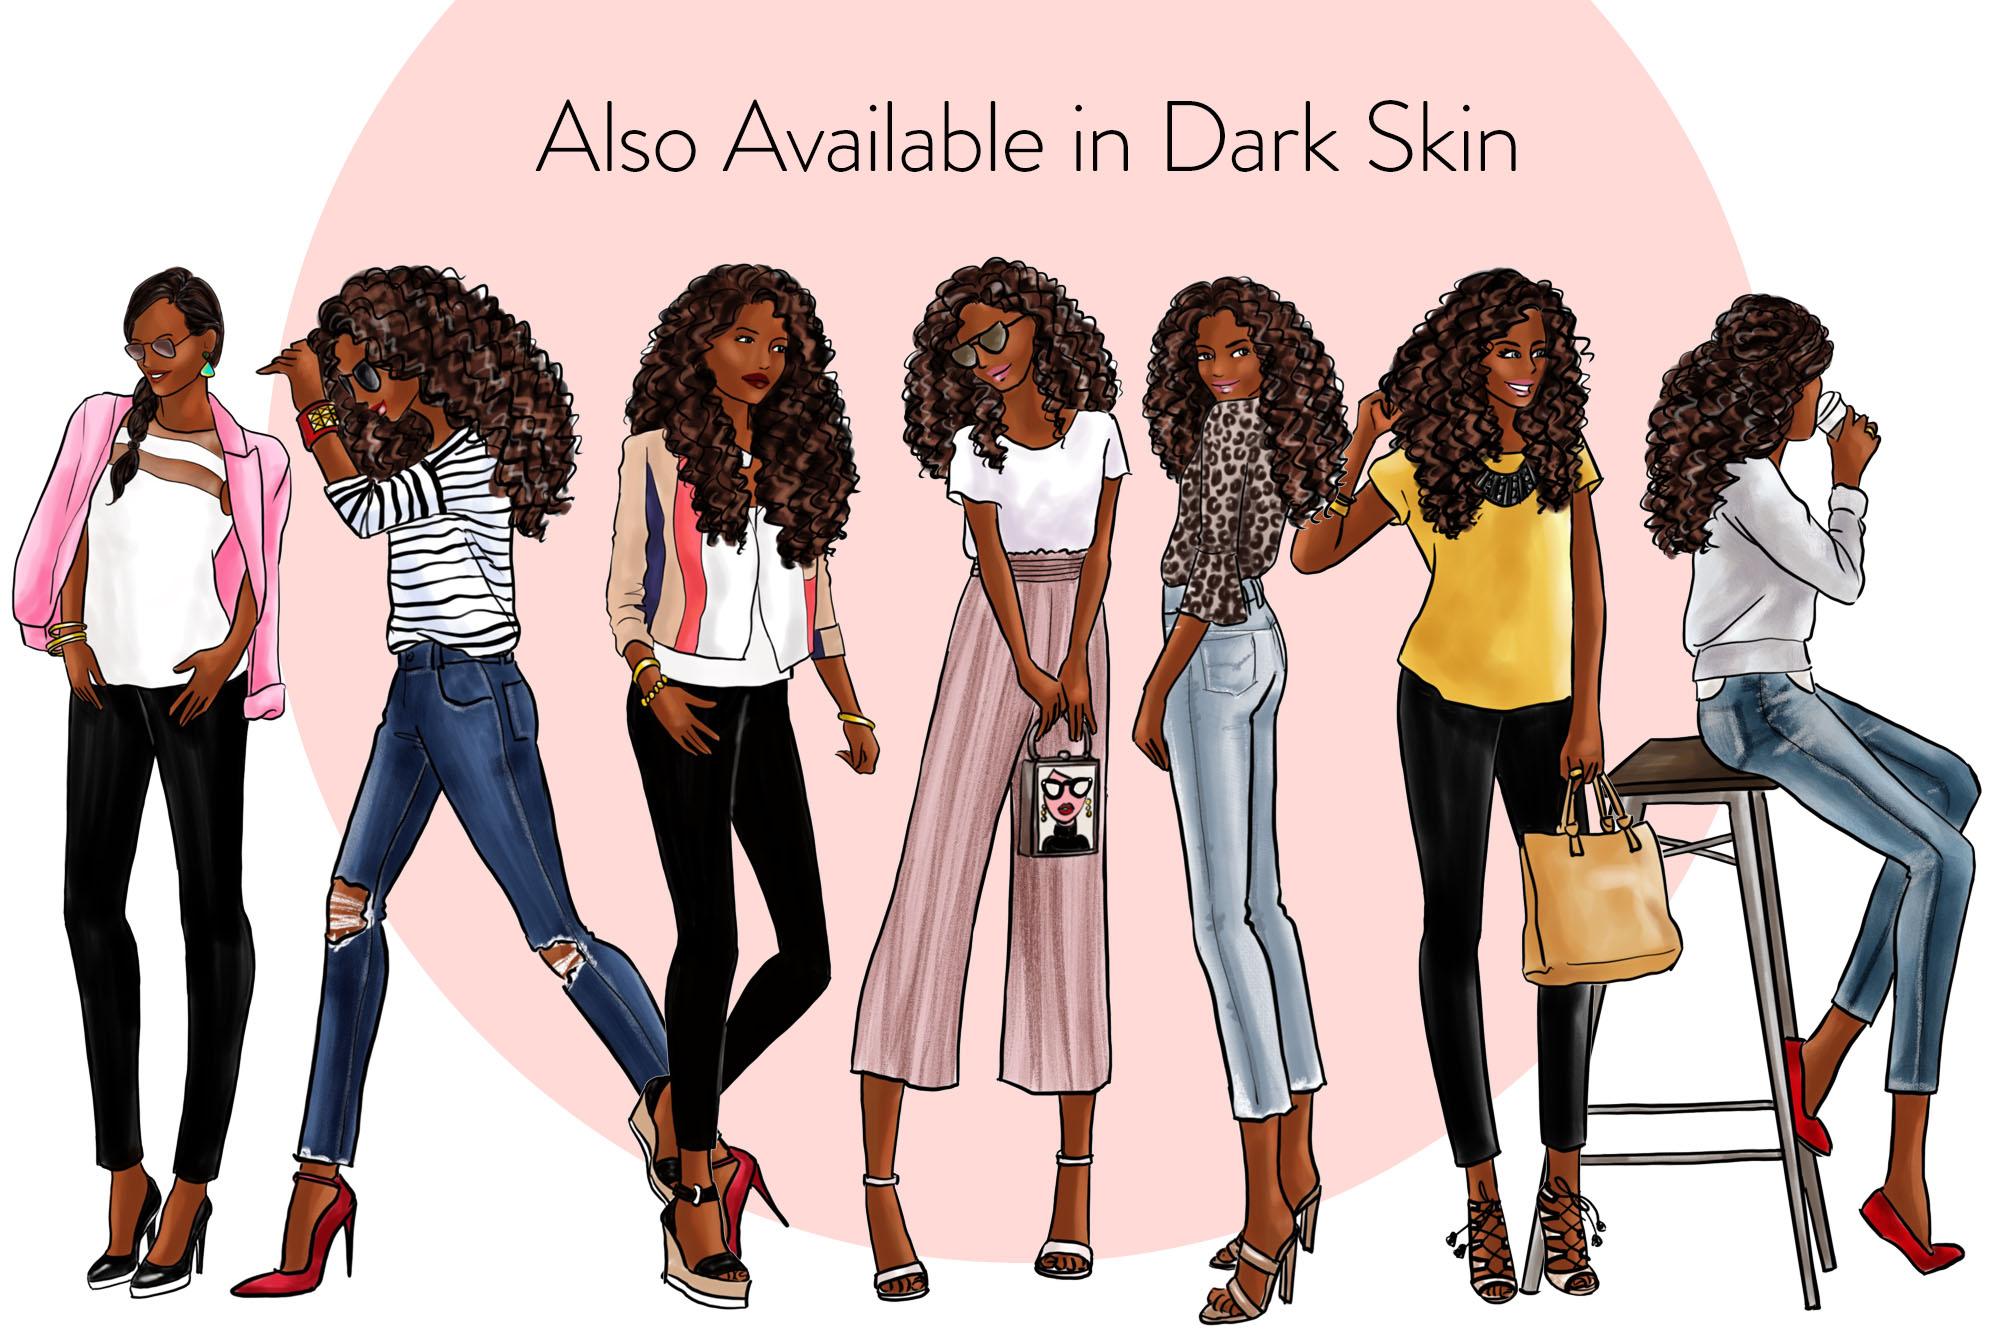 Fashion illustration clipart - Fashion Girls 31 - Light Skin example image 4